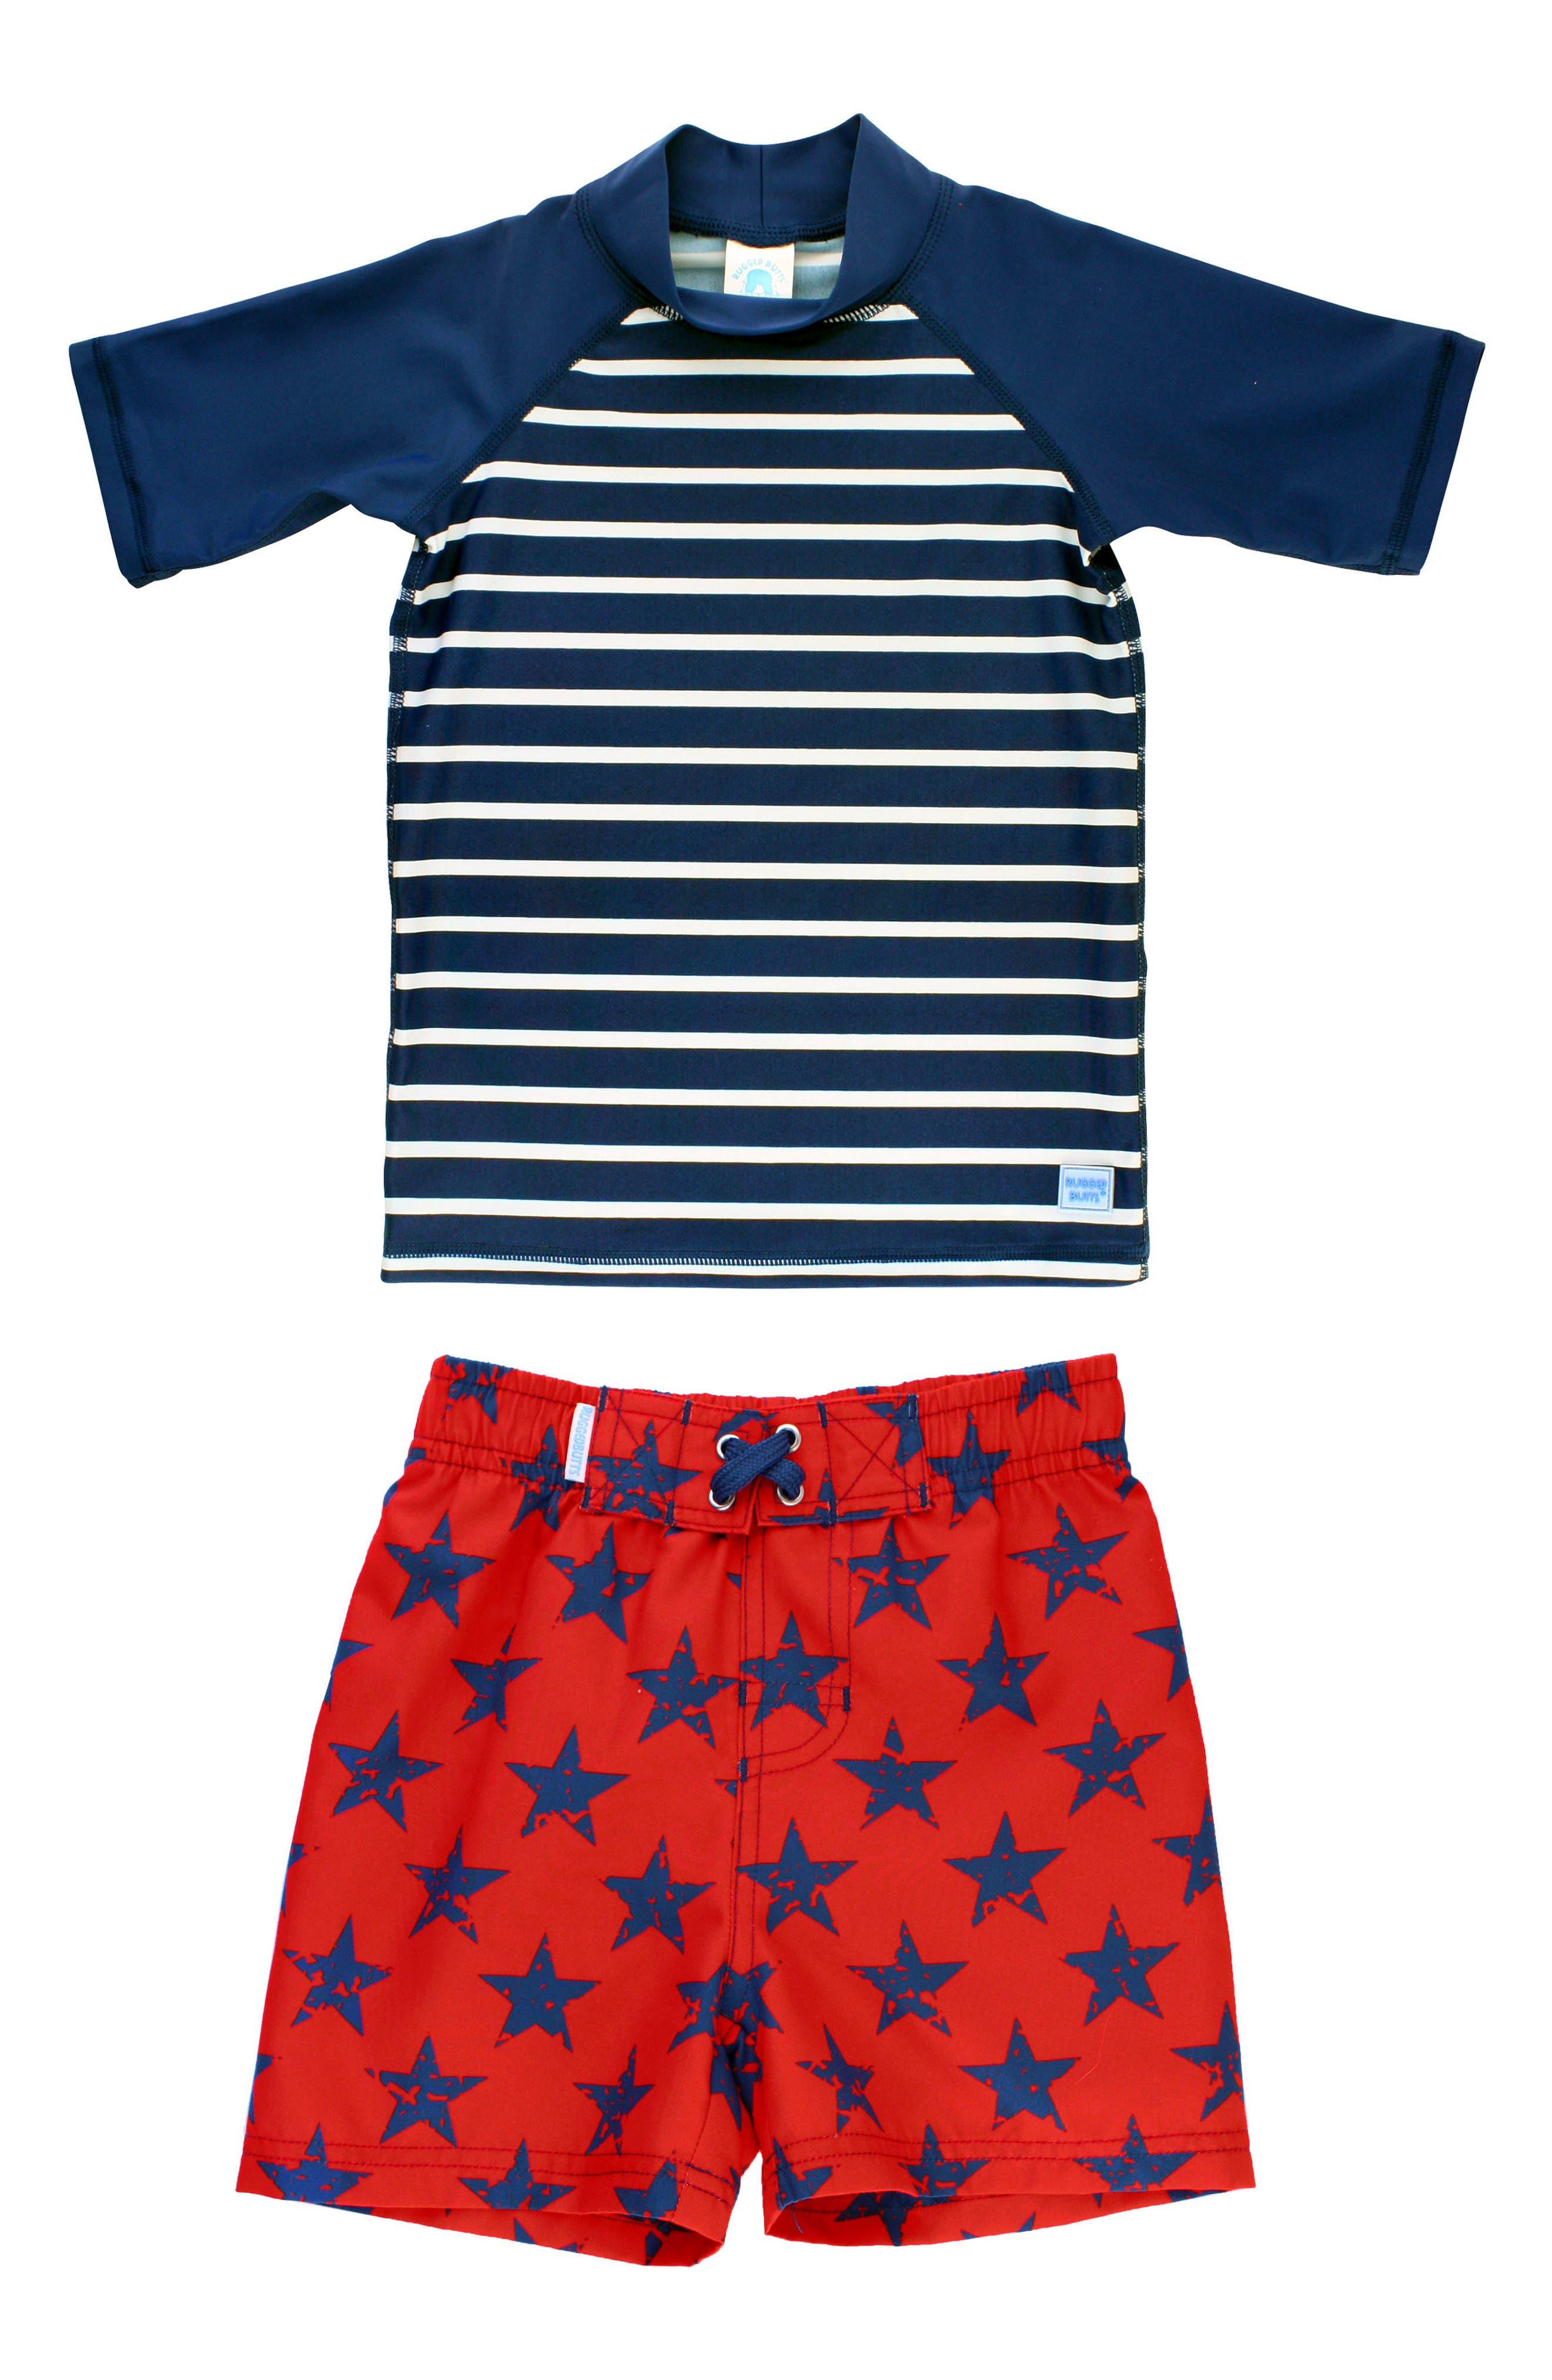 RuggedButts Navy Stripe Two-Piece Rashguard Swimsuit (Baby Boys)